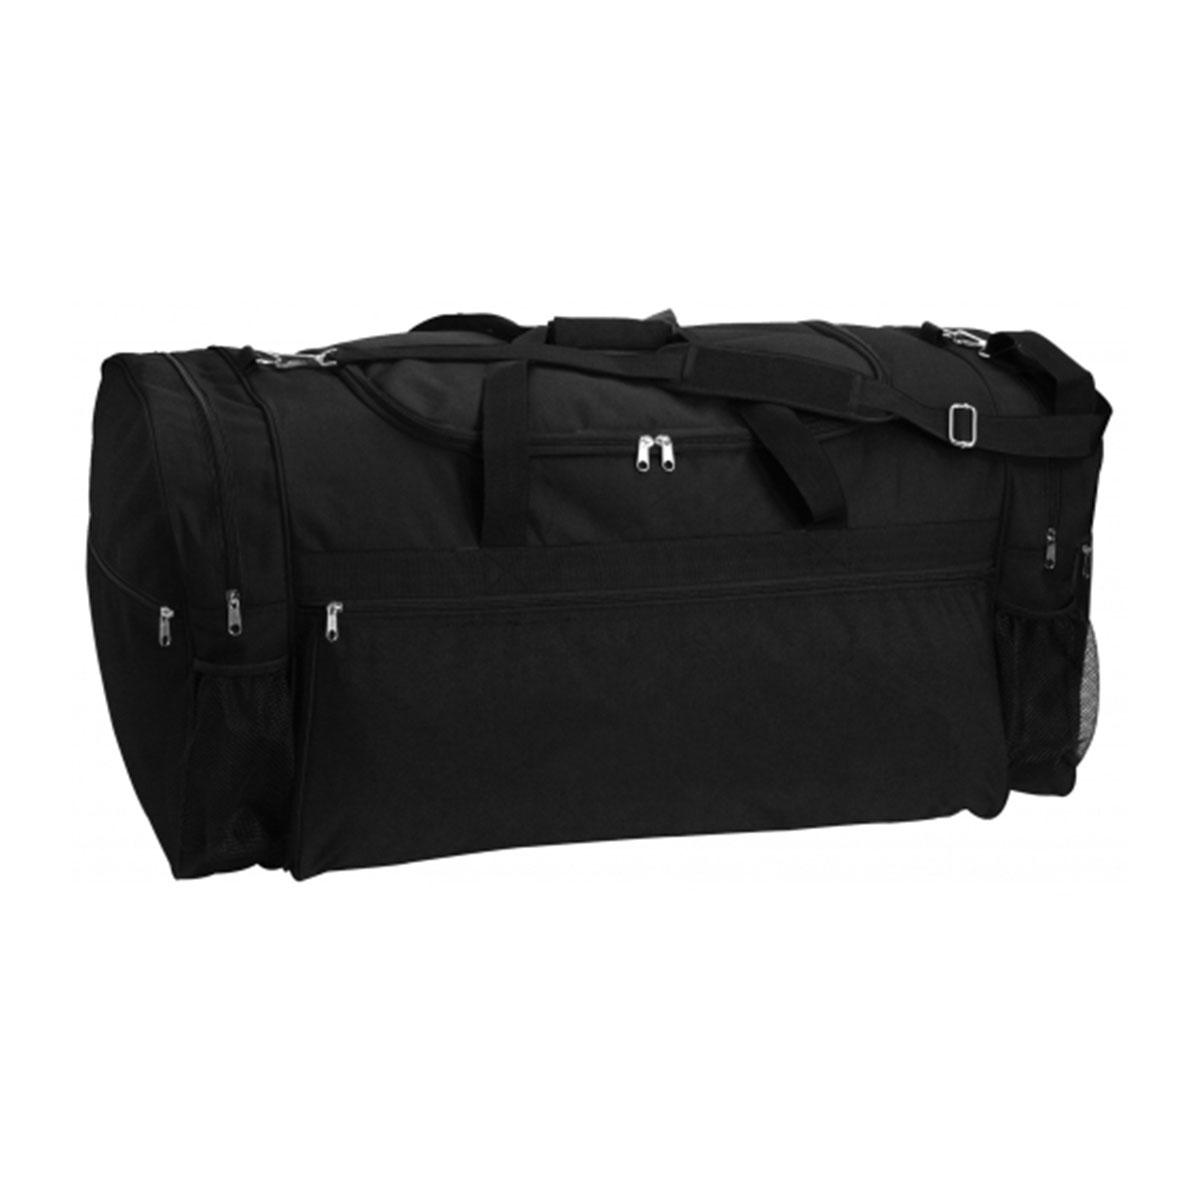 Large Sports Bag-Black